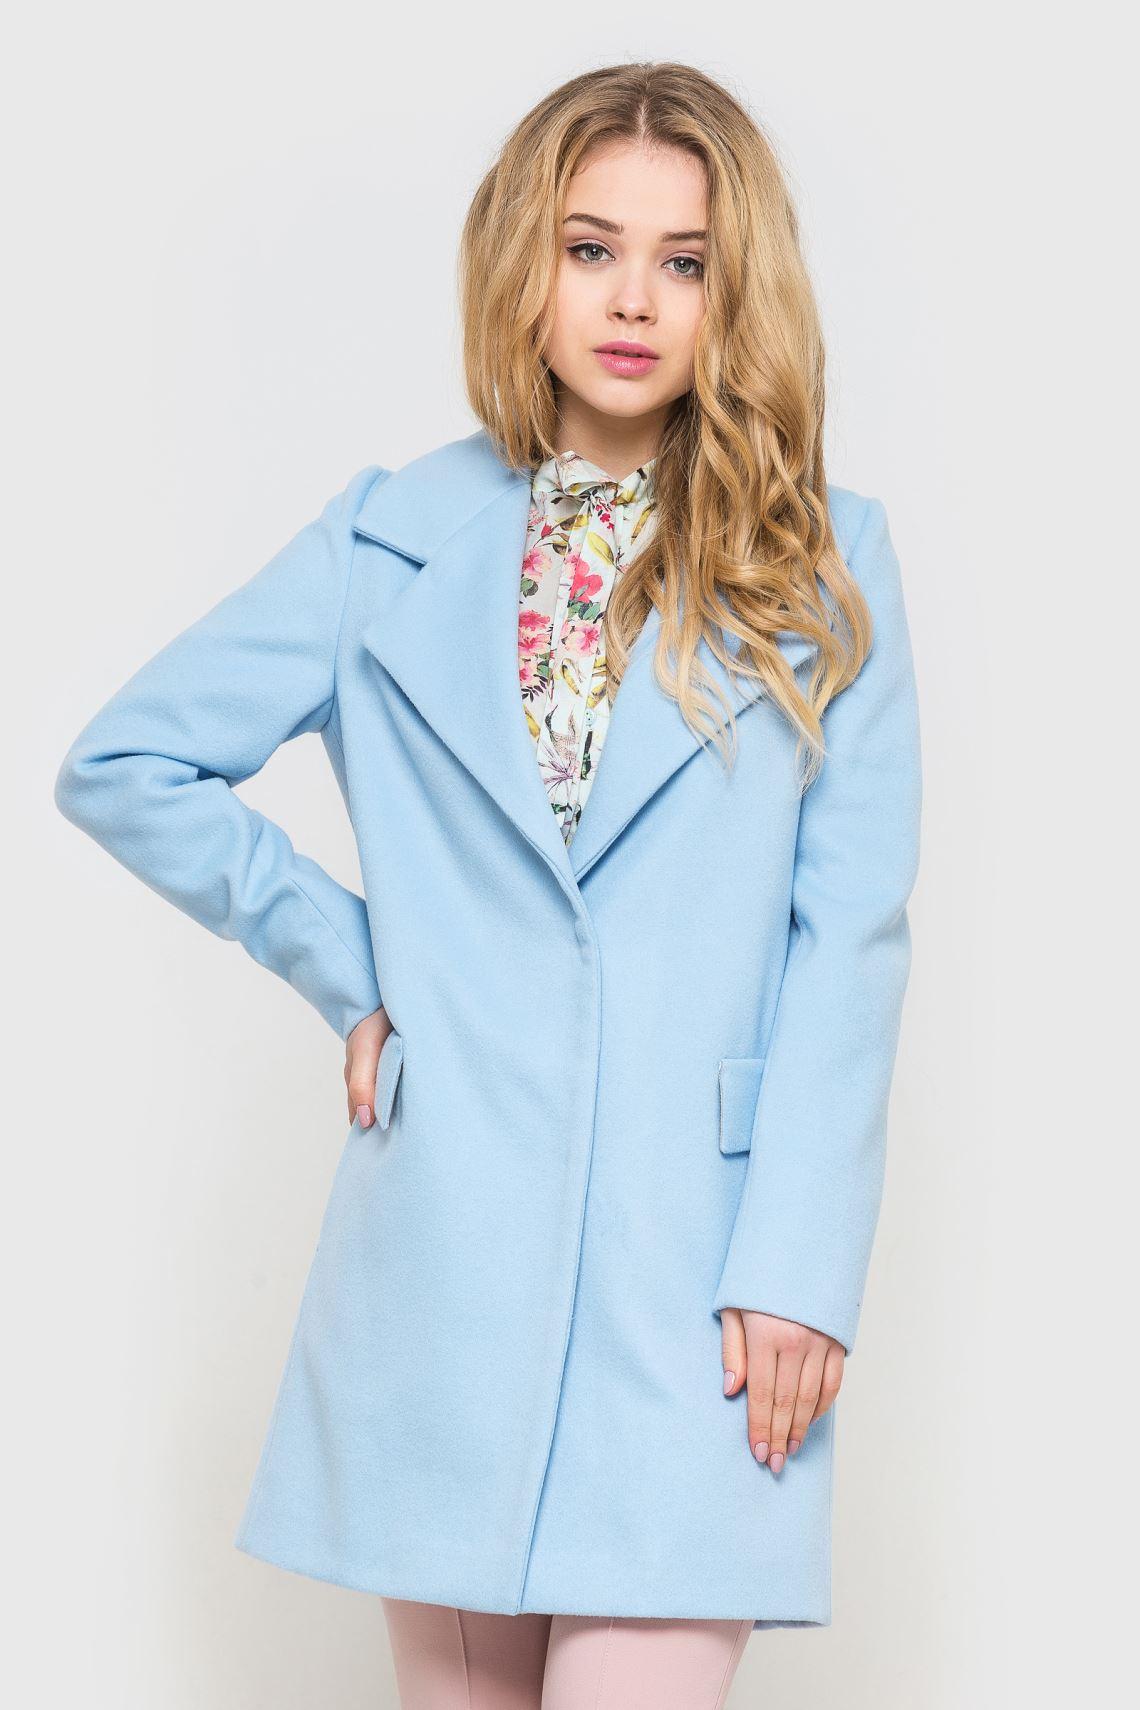 Пальто жіноче блакитне коротке  27a983d03886b